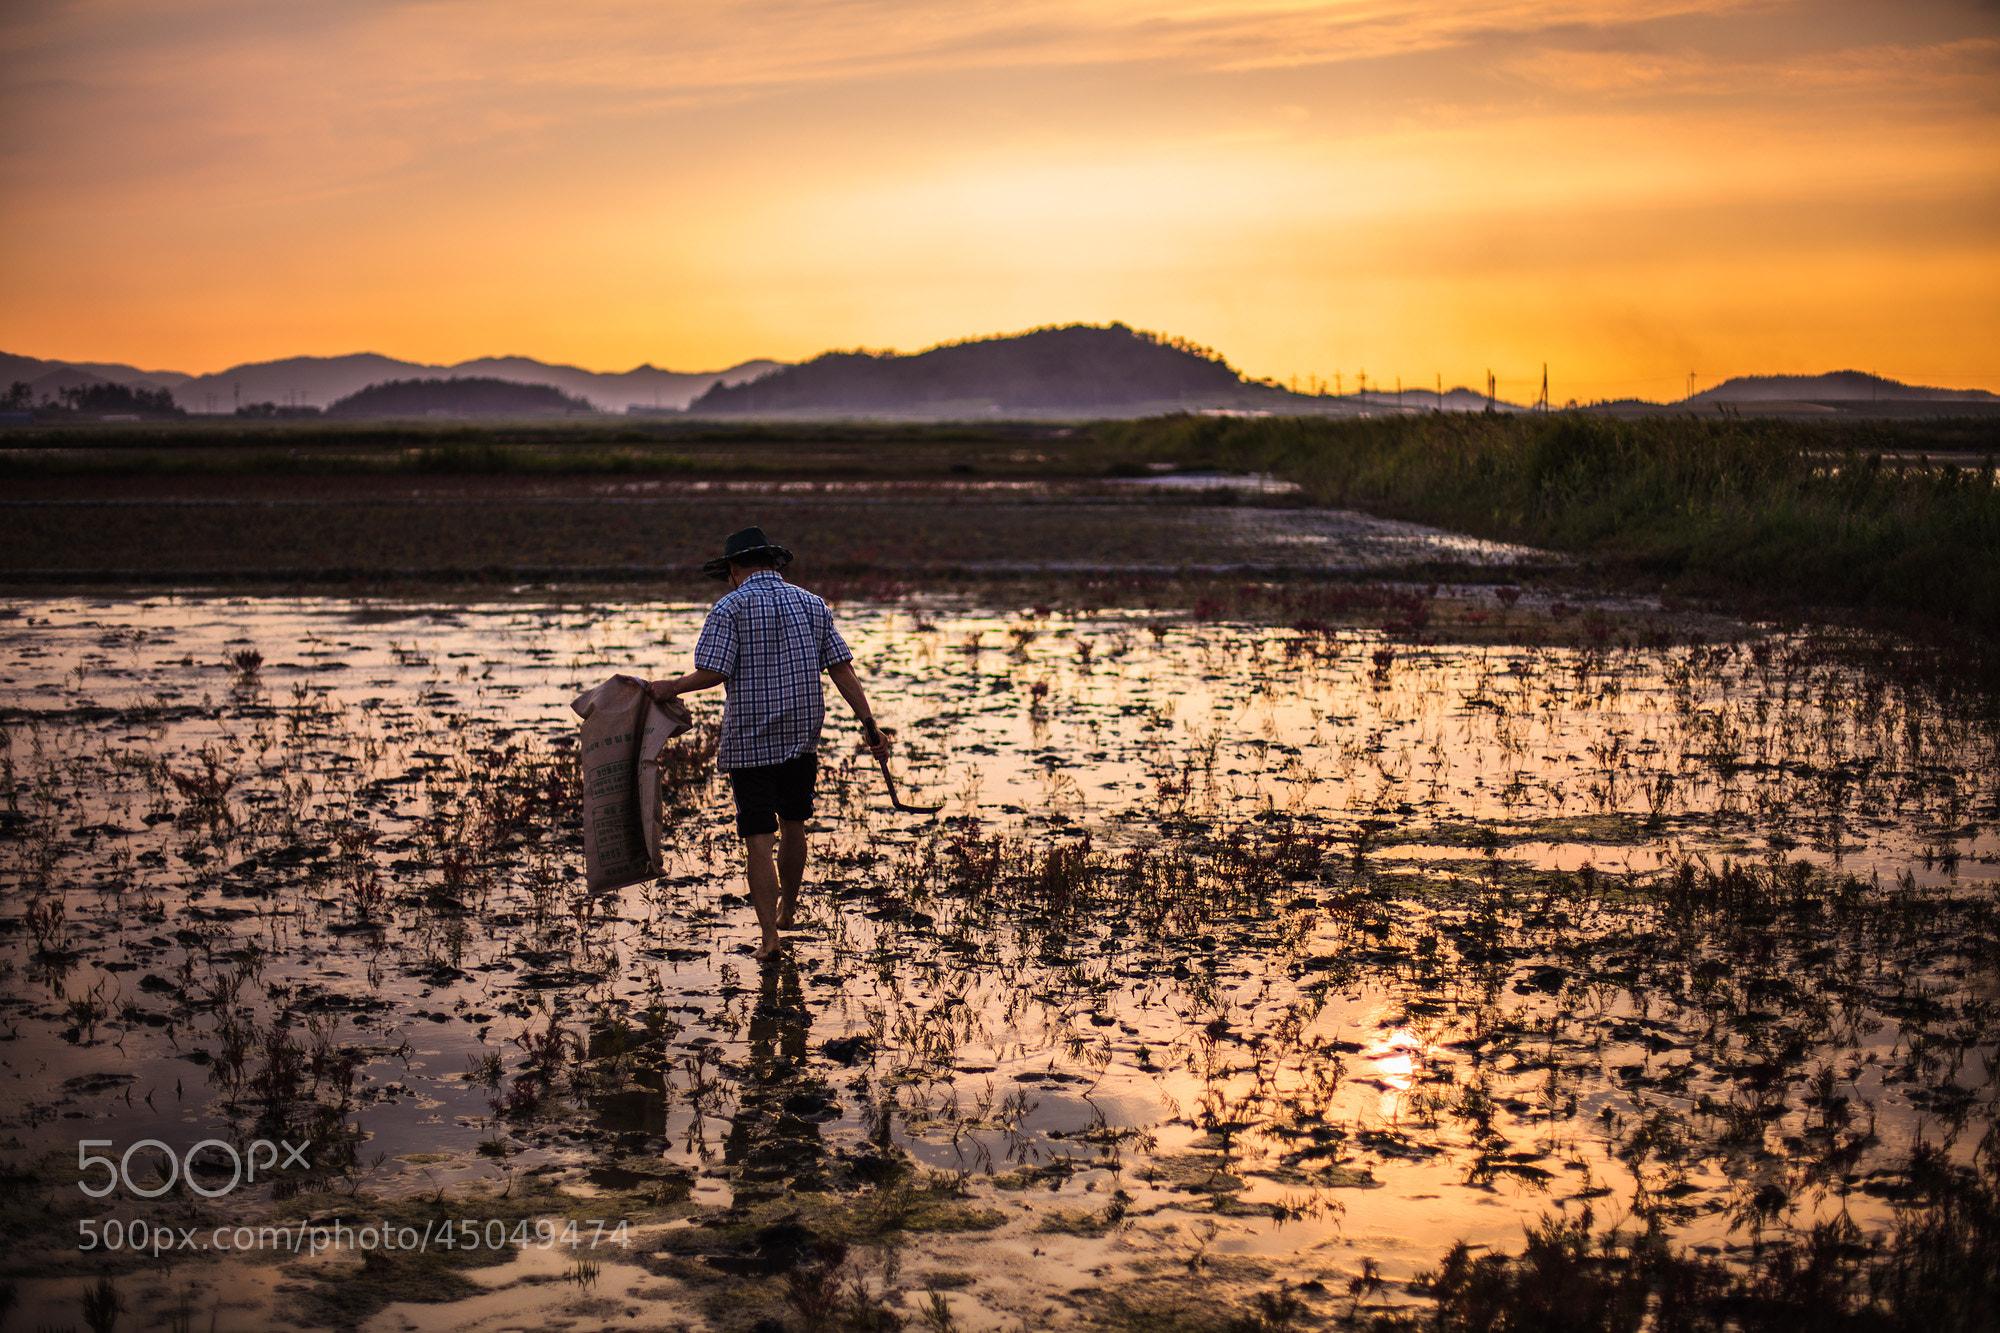 Photograph sunset saltern by kim chaejin on 500px